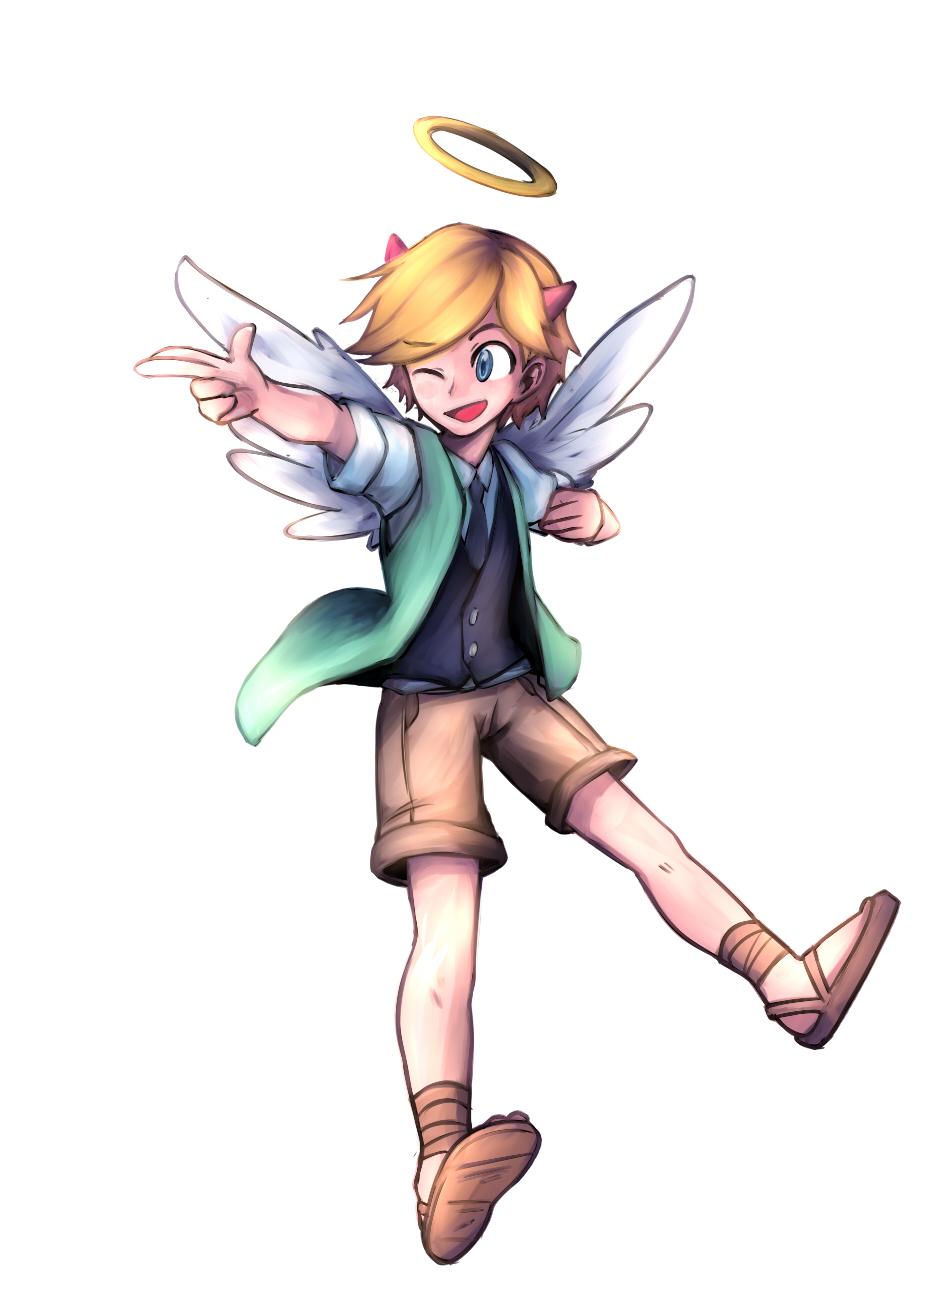 svtfoe x angel au by weidao